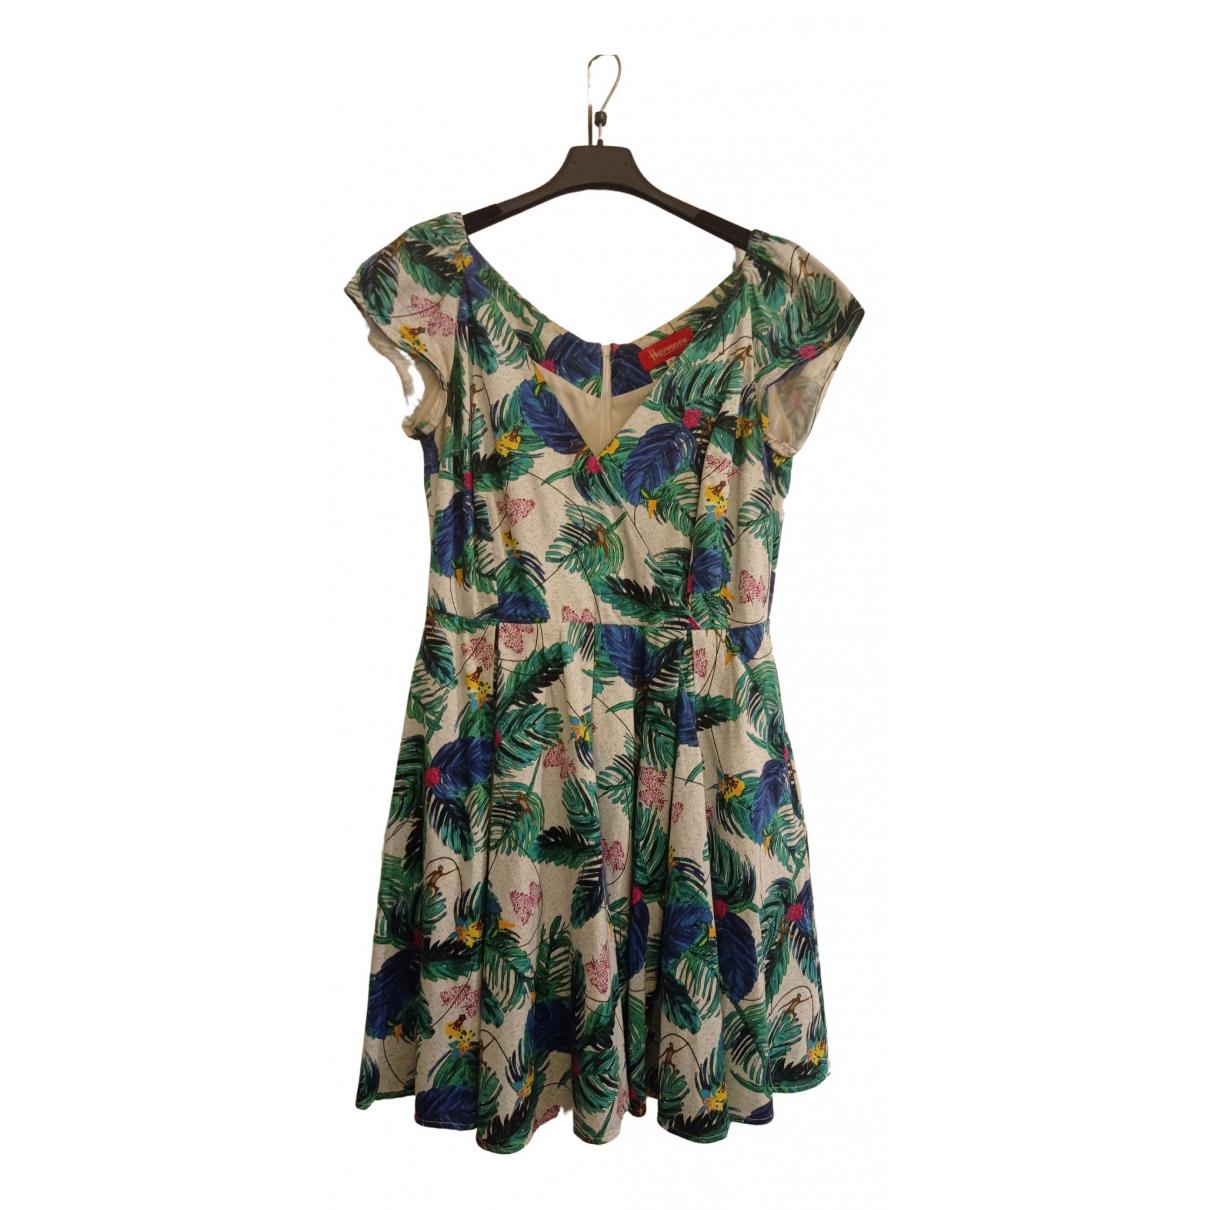 Maison Hēroine \N Kleid in  Bunt Baumwolle - Elasthan